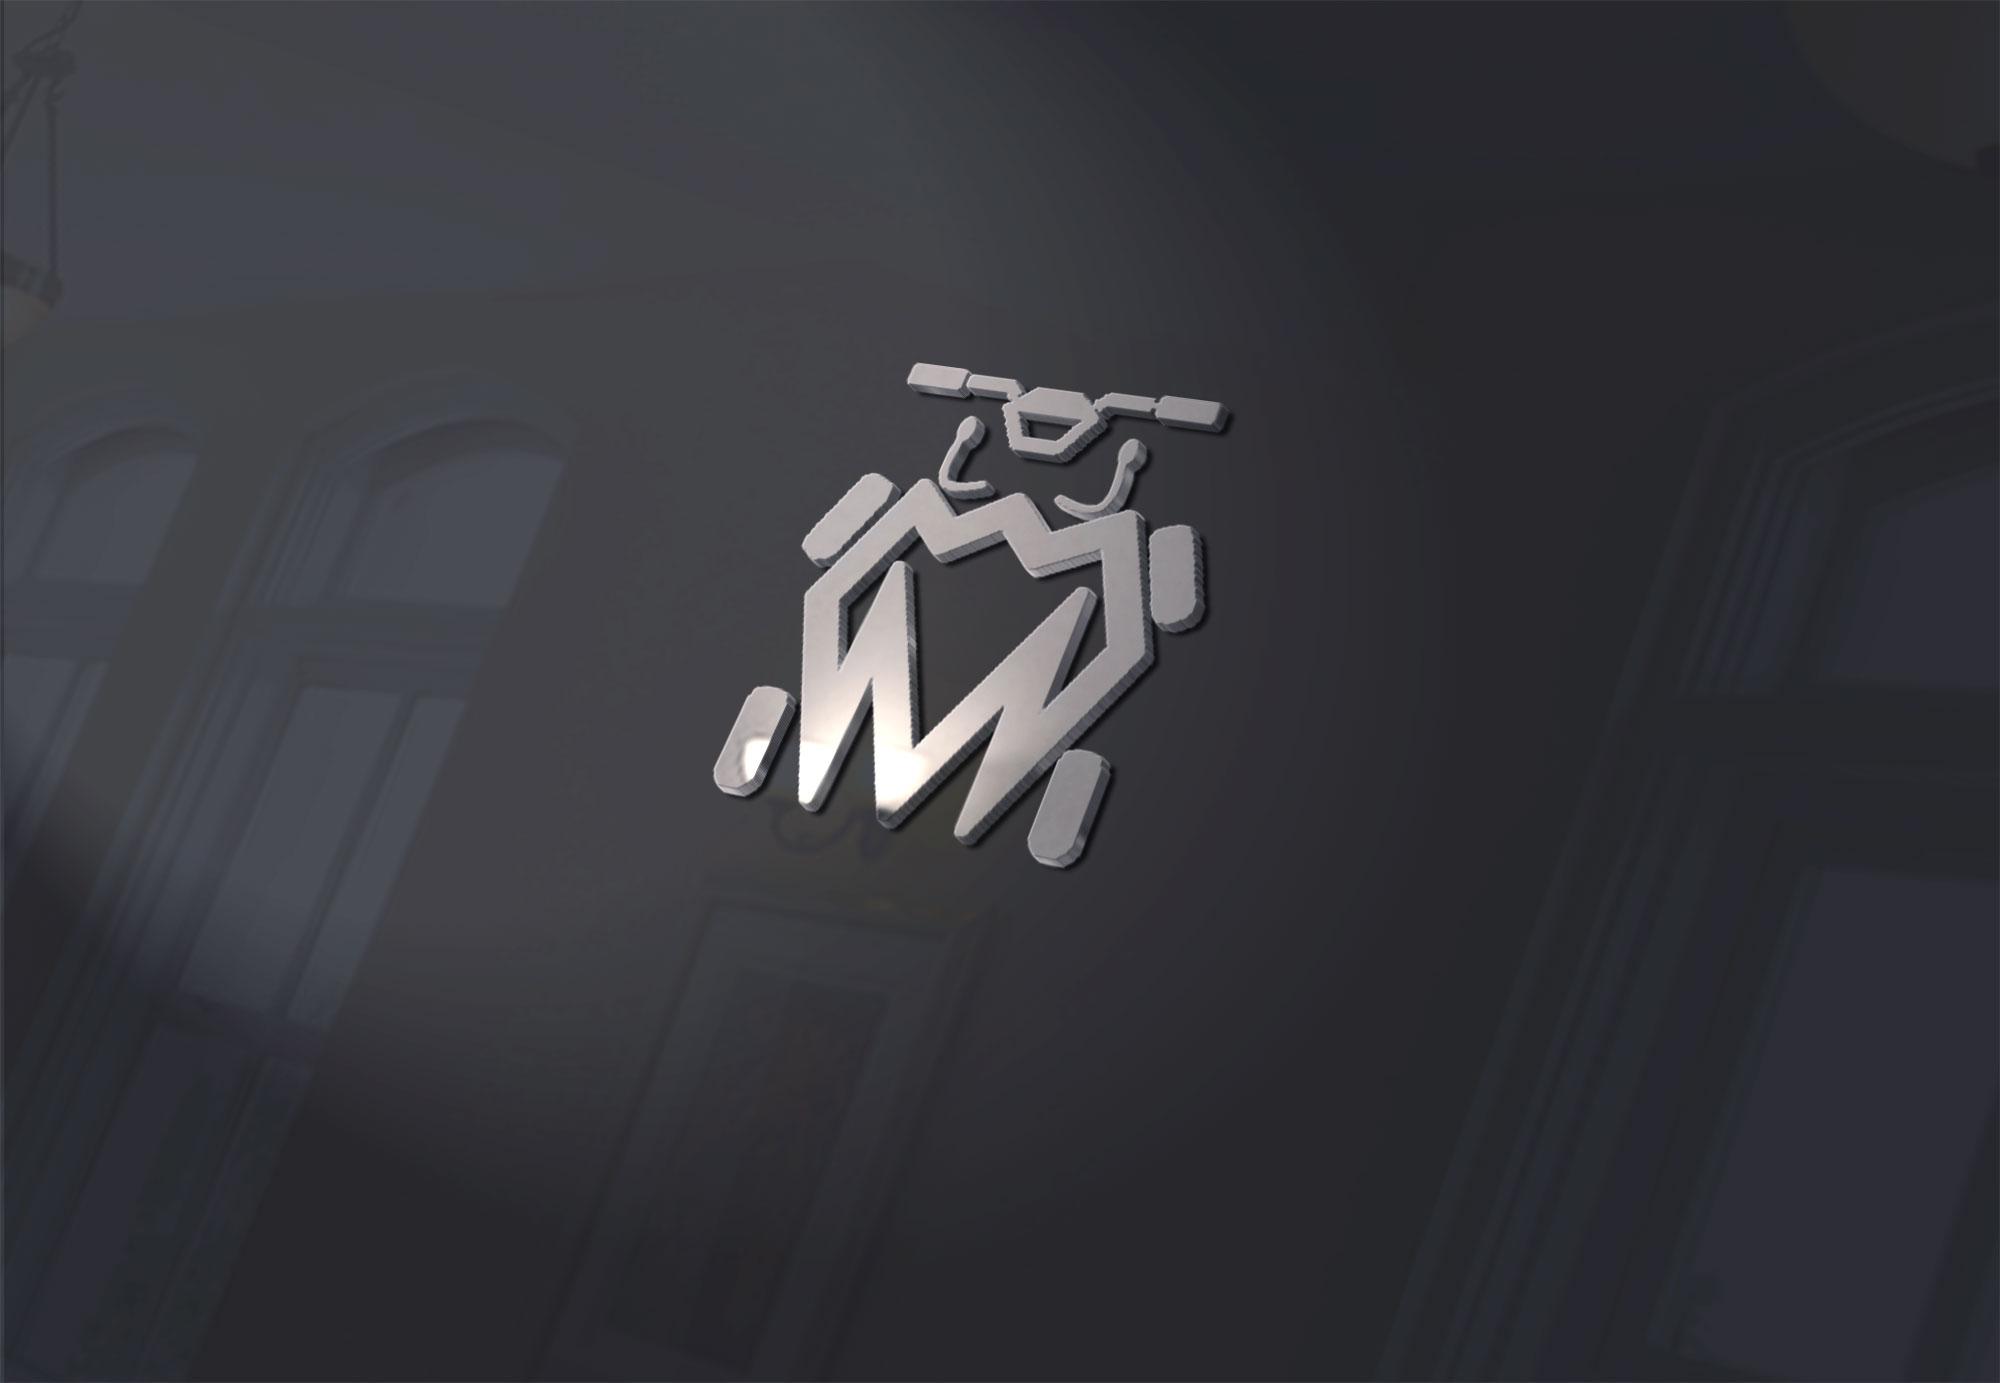 Нужен логотип (эмблема) для самодельного квадроцикла фото f_5255b04115d42ca4.jpg